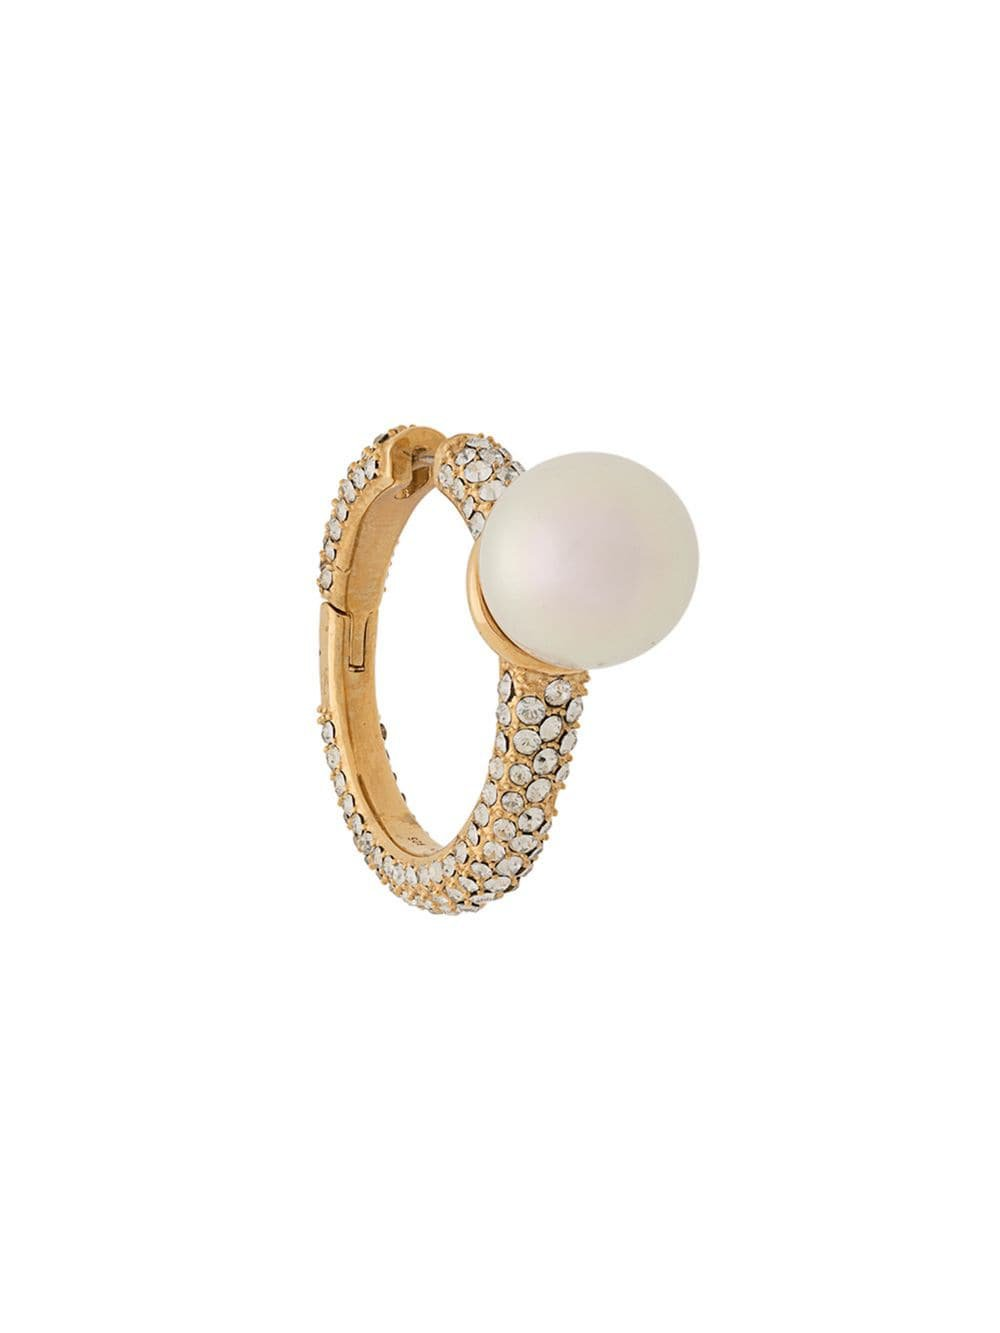 AMBUSH pearl and crystal earring